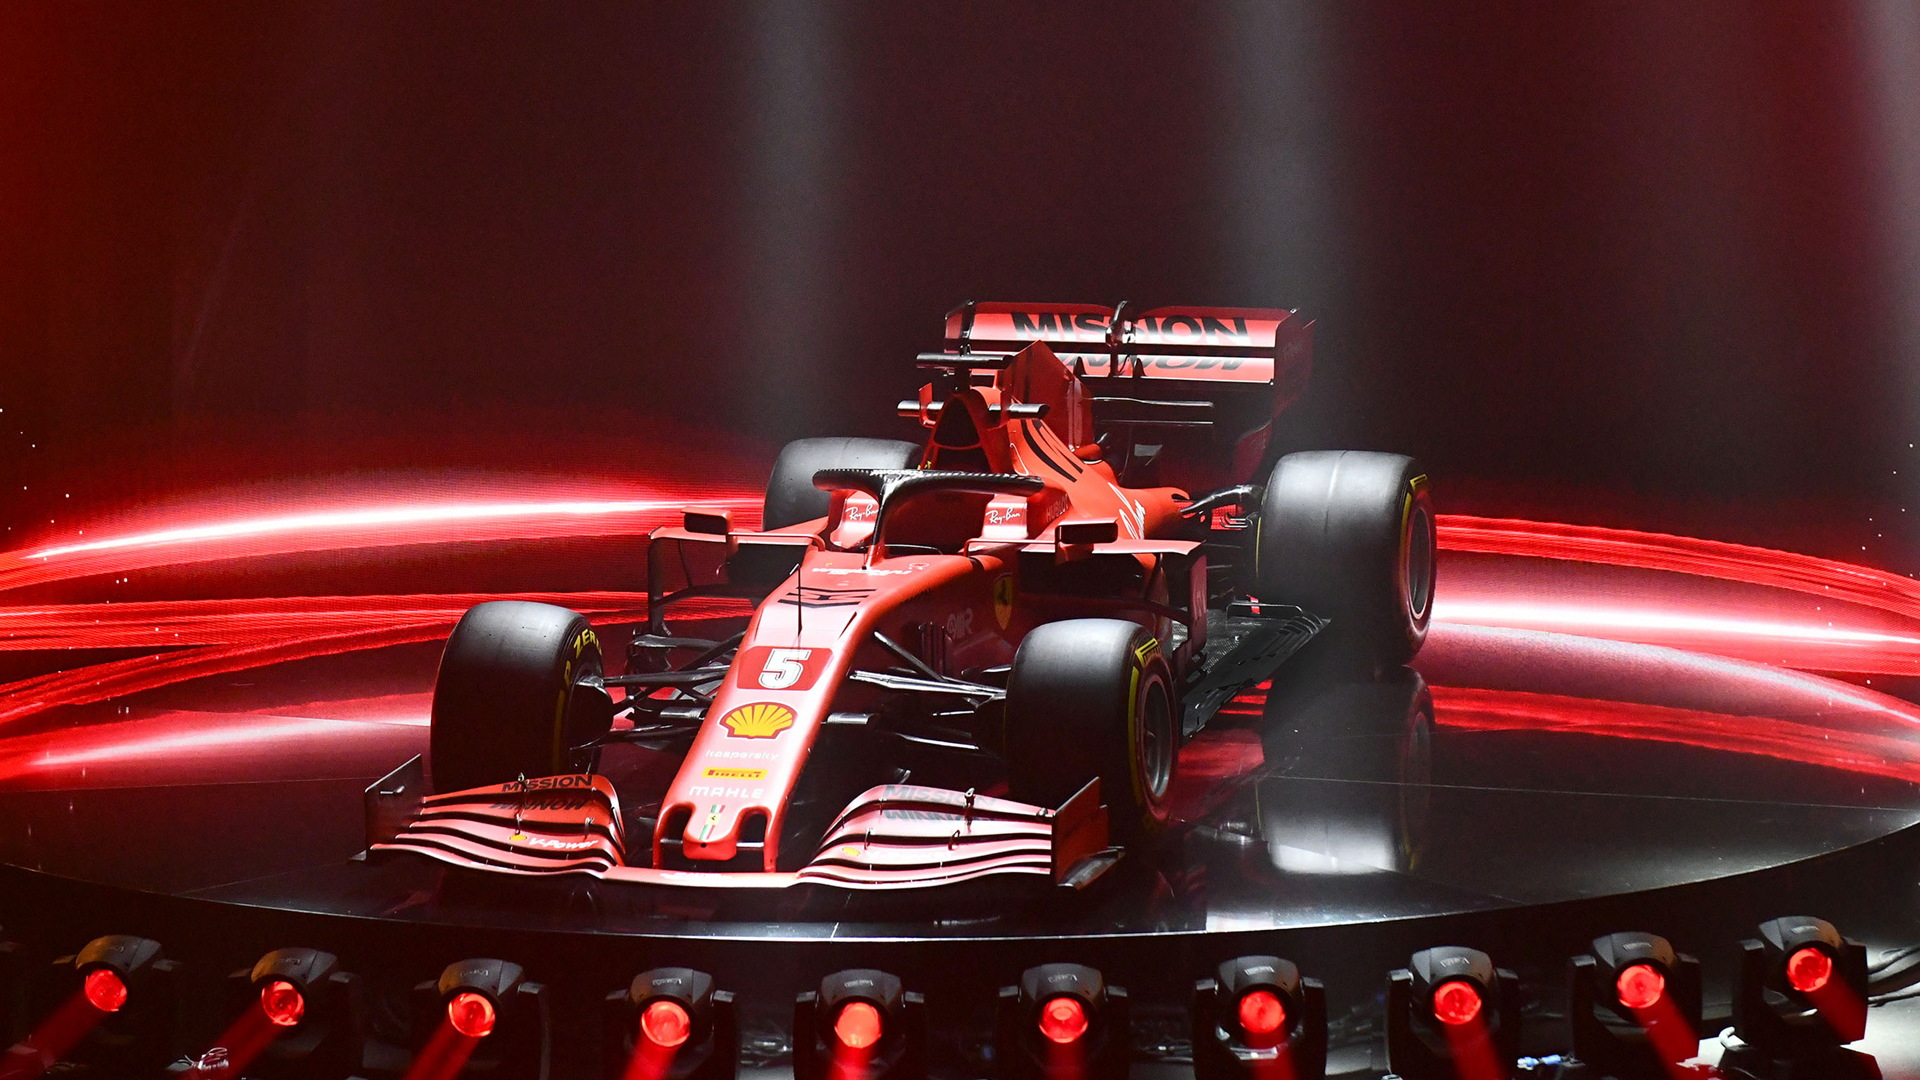 Ferrari SF1000 2020 Formula One race car